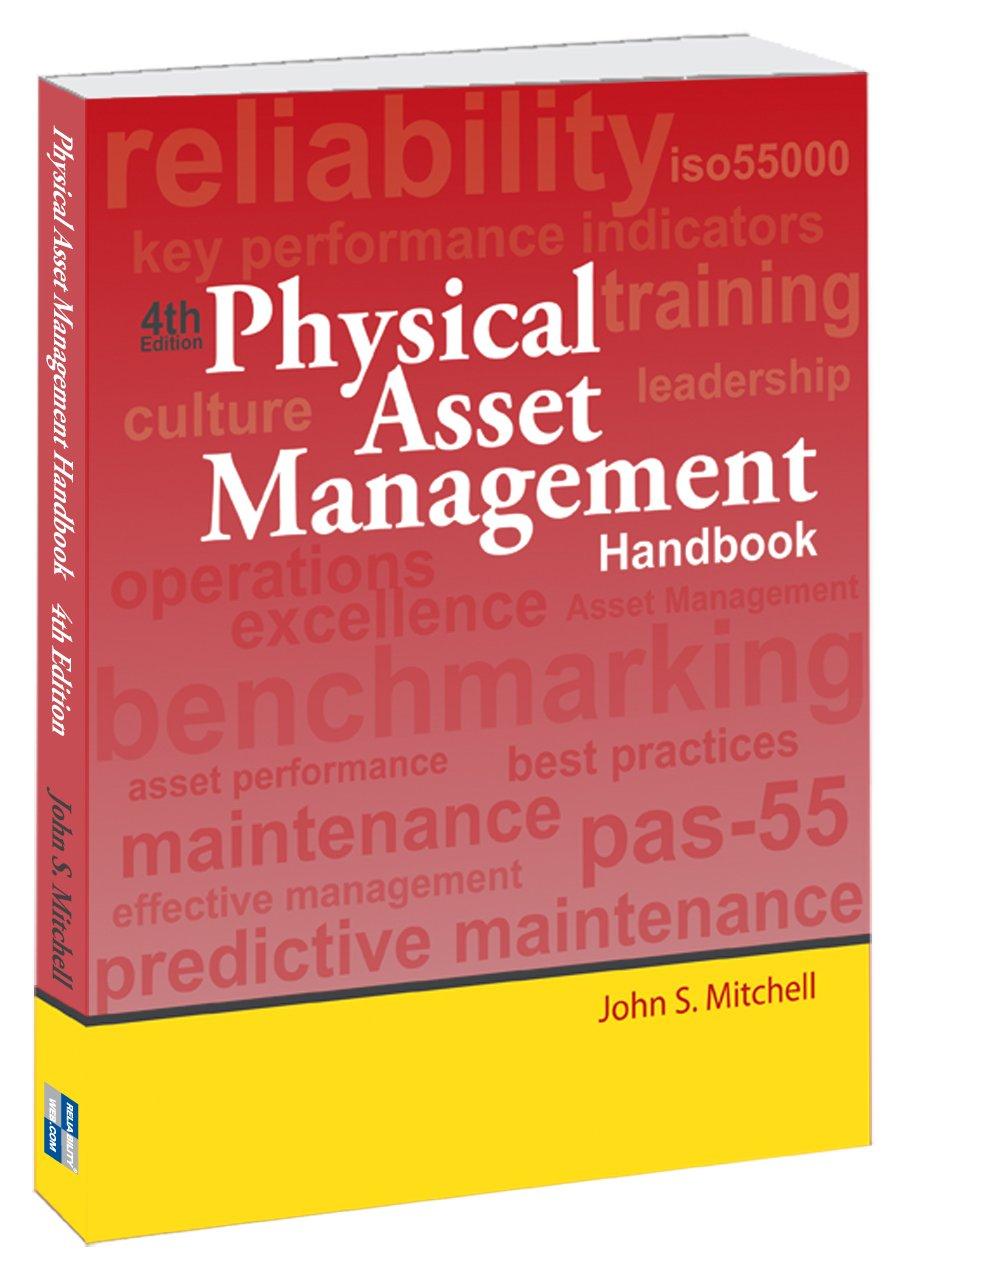 Physical asset management handbook john s mitchell 9780985361938 physical asset management handbook john s mitchell 9780985361938 amazon books fandeluxe Image collections